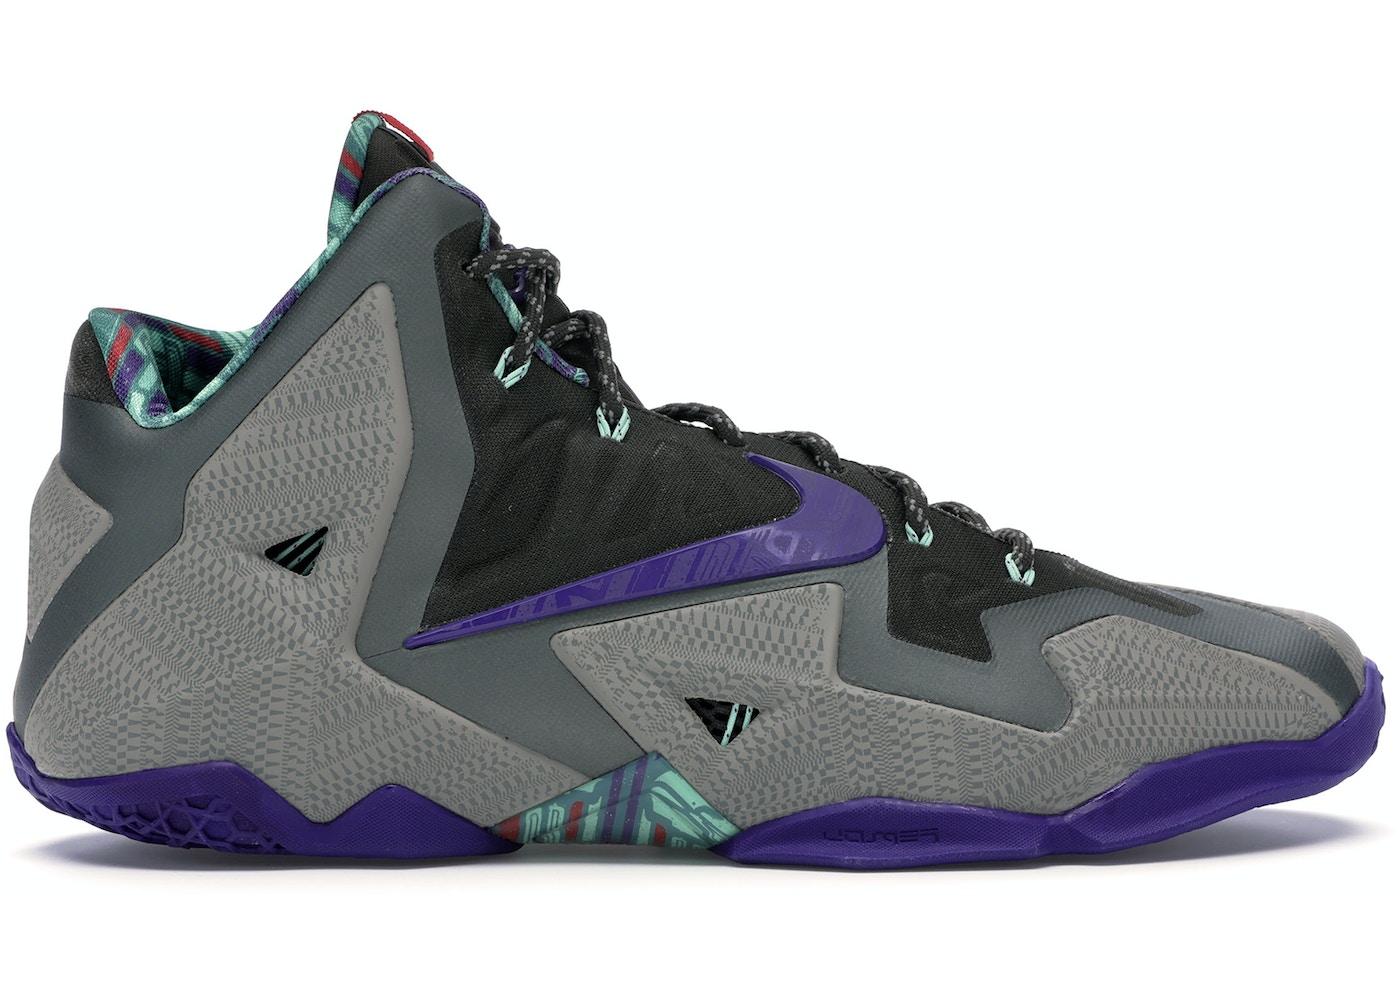 sale retailer 295b3 5045b Buy Nike LeBron 11 Shoes   Deadstock Sneakers